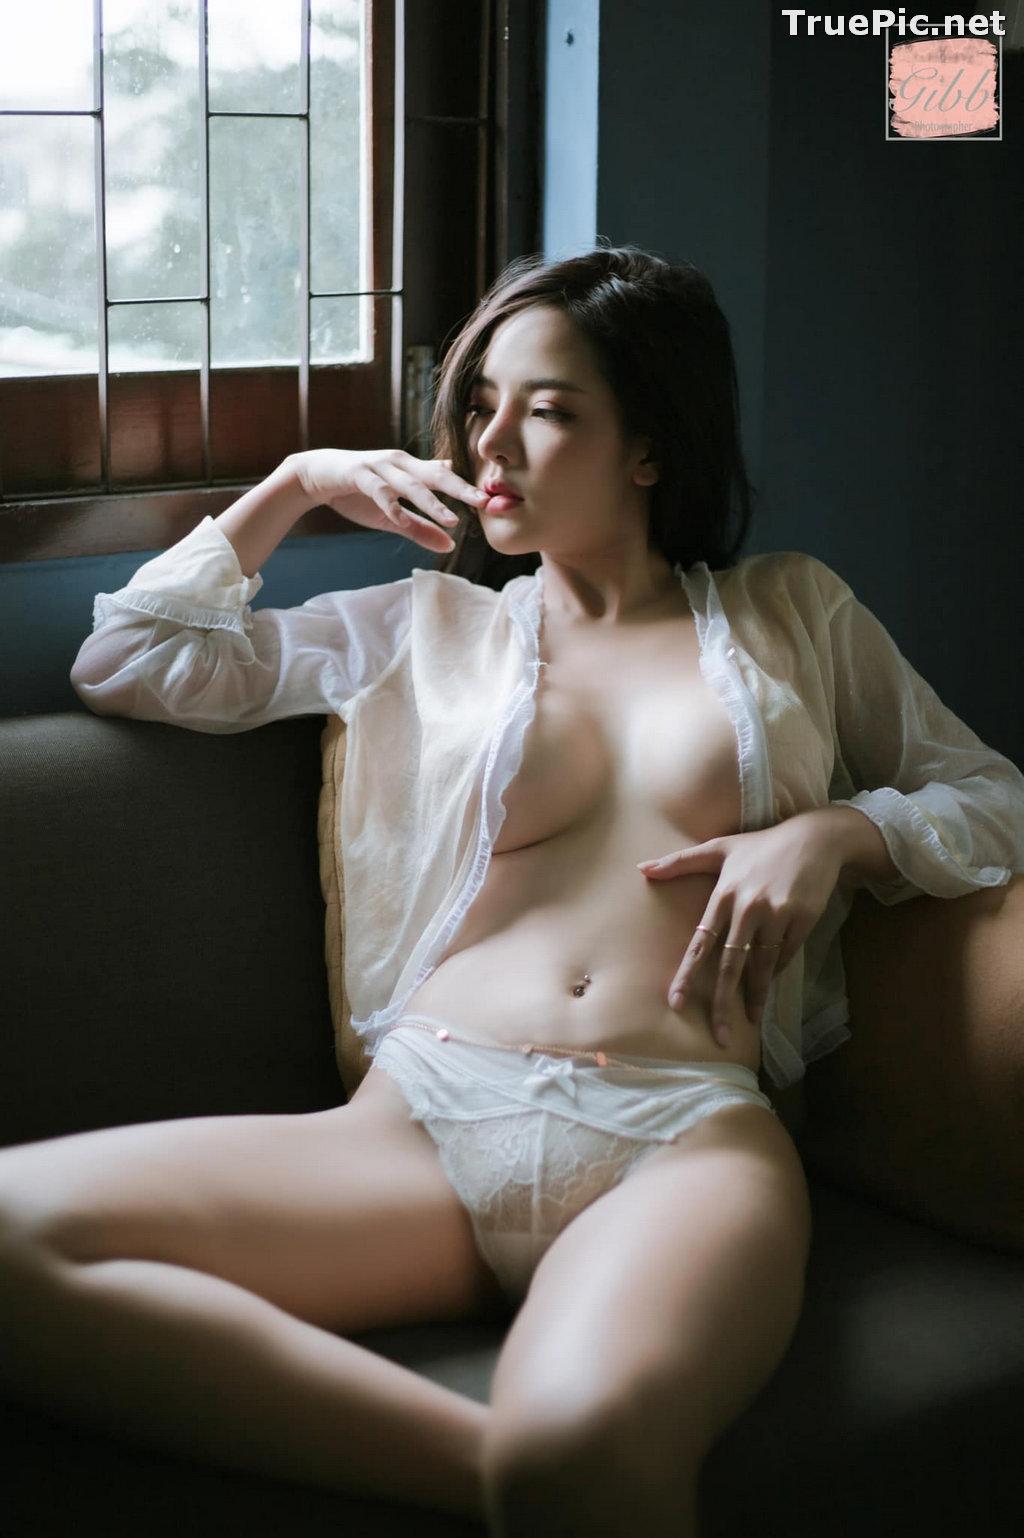 Image Thailand Sexy Model - Montakan Kaengraeng - Hot Meow Meow Kitten - TruePic.net - Picture-3